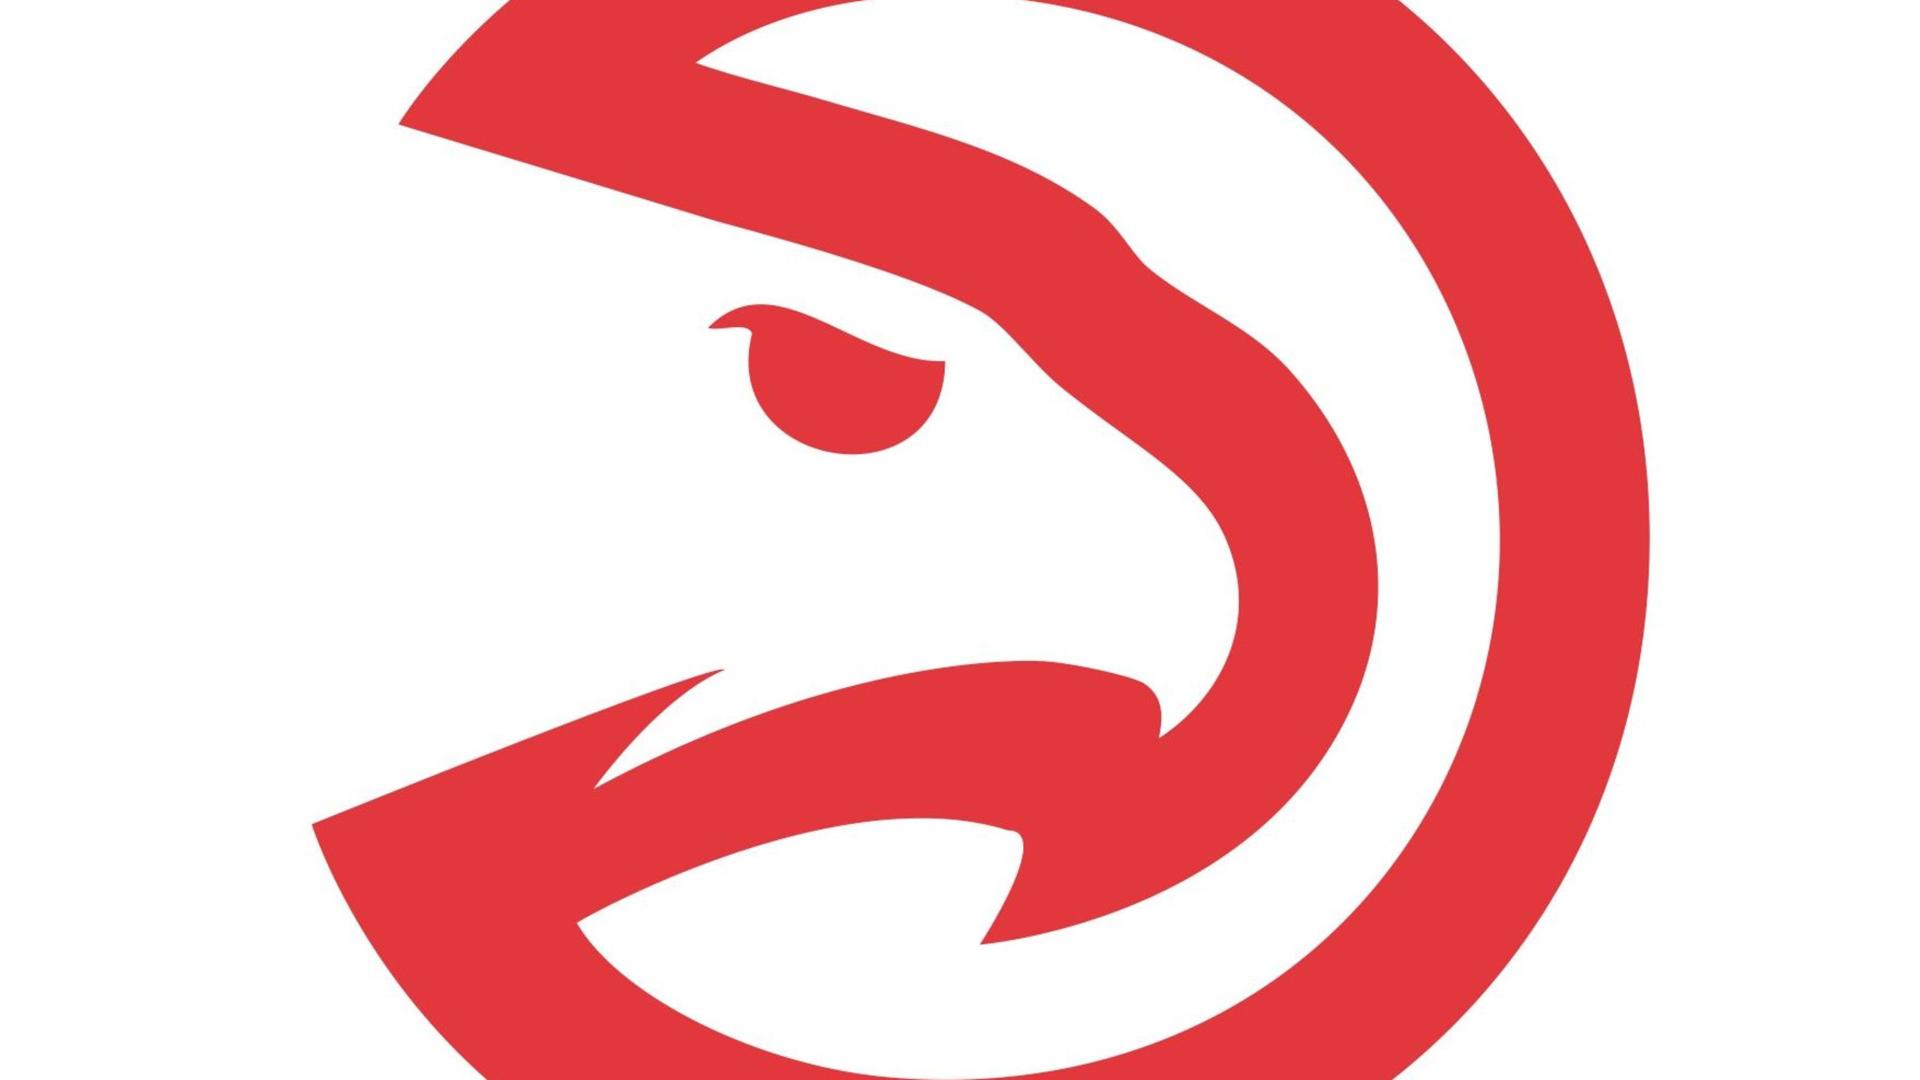 Atlanta Hawks High Definition Wallpapers